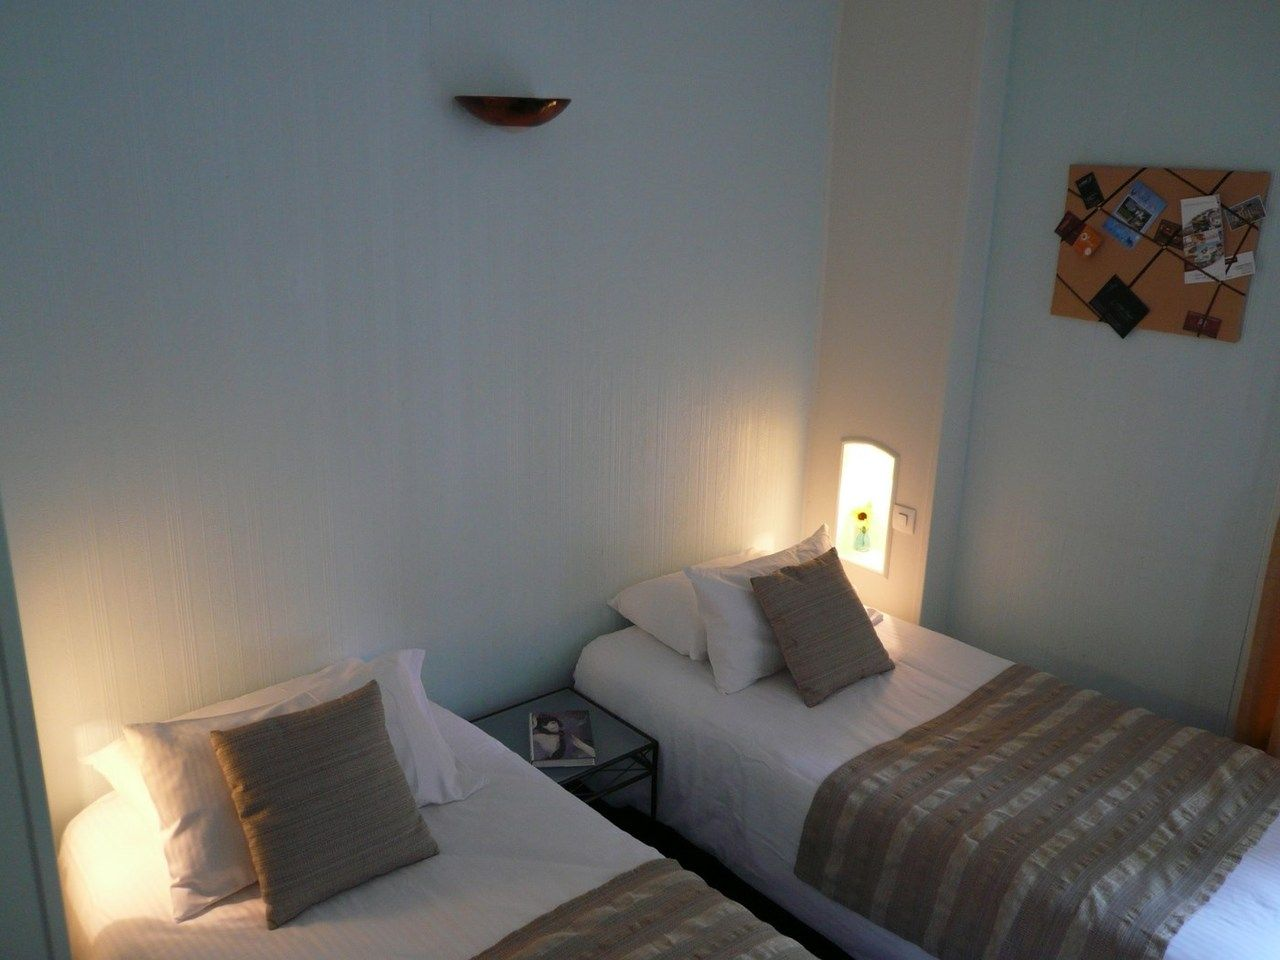 Chambre Contact Hôtel DU CROISE à MARCQ EN BAROEUL